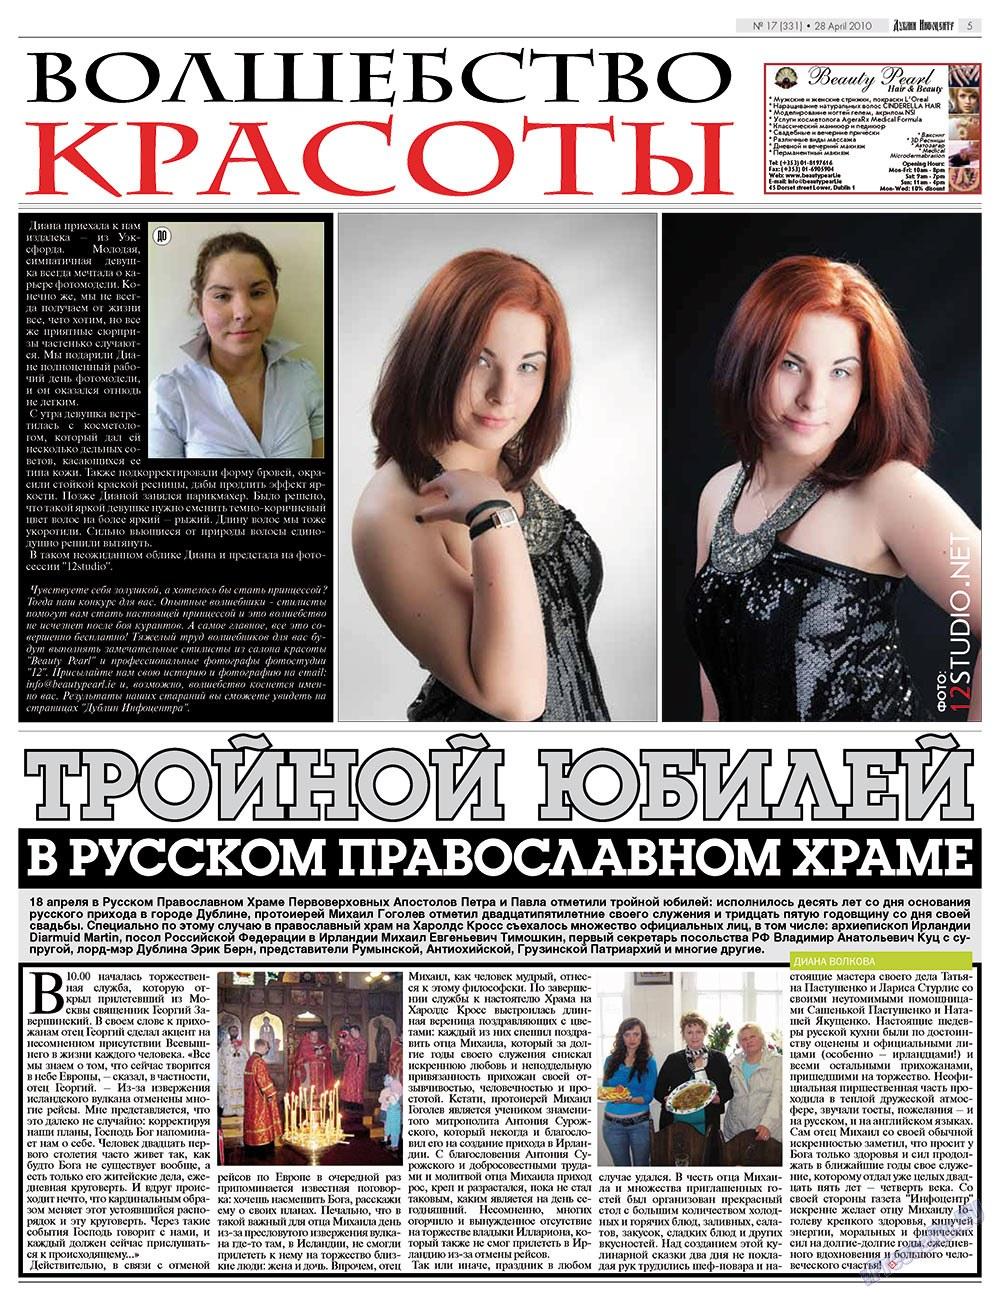 Дублин инфоцентр (газета). 2010 год, номер 17, стр. 5